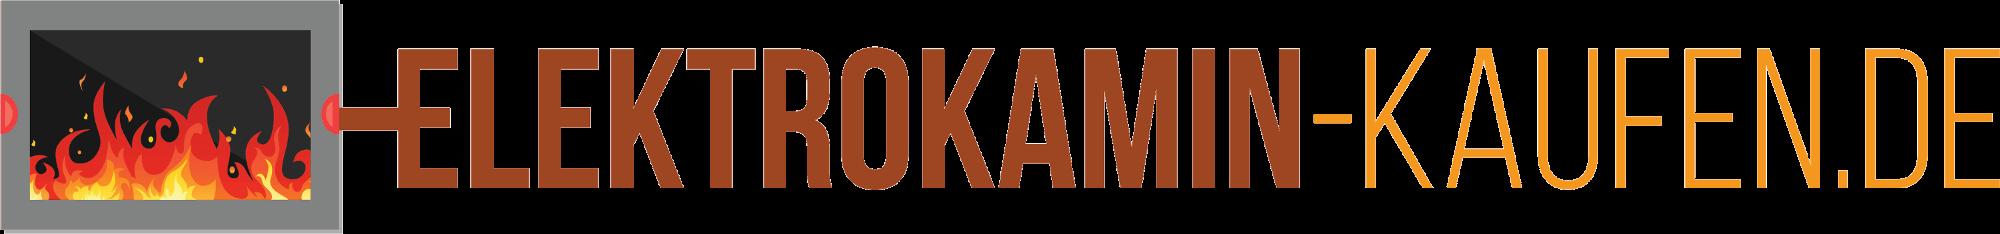 header-logo-Elektrokamin-Kaufen.de